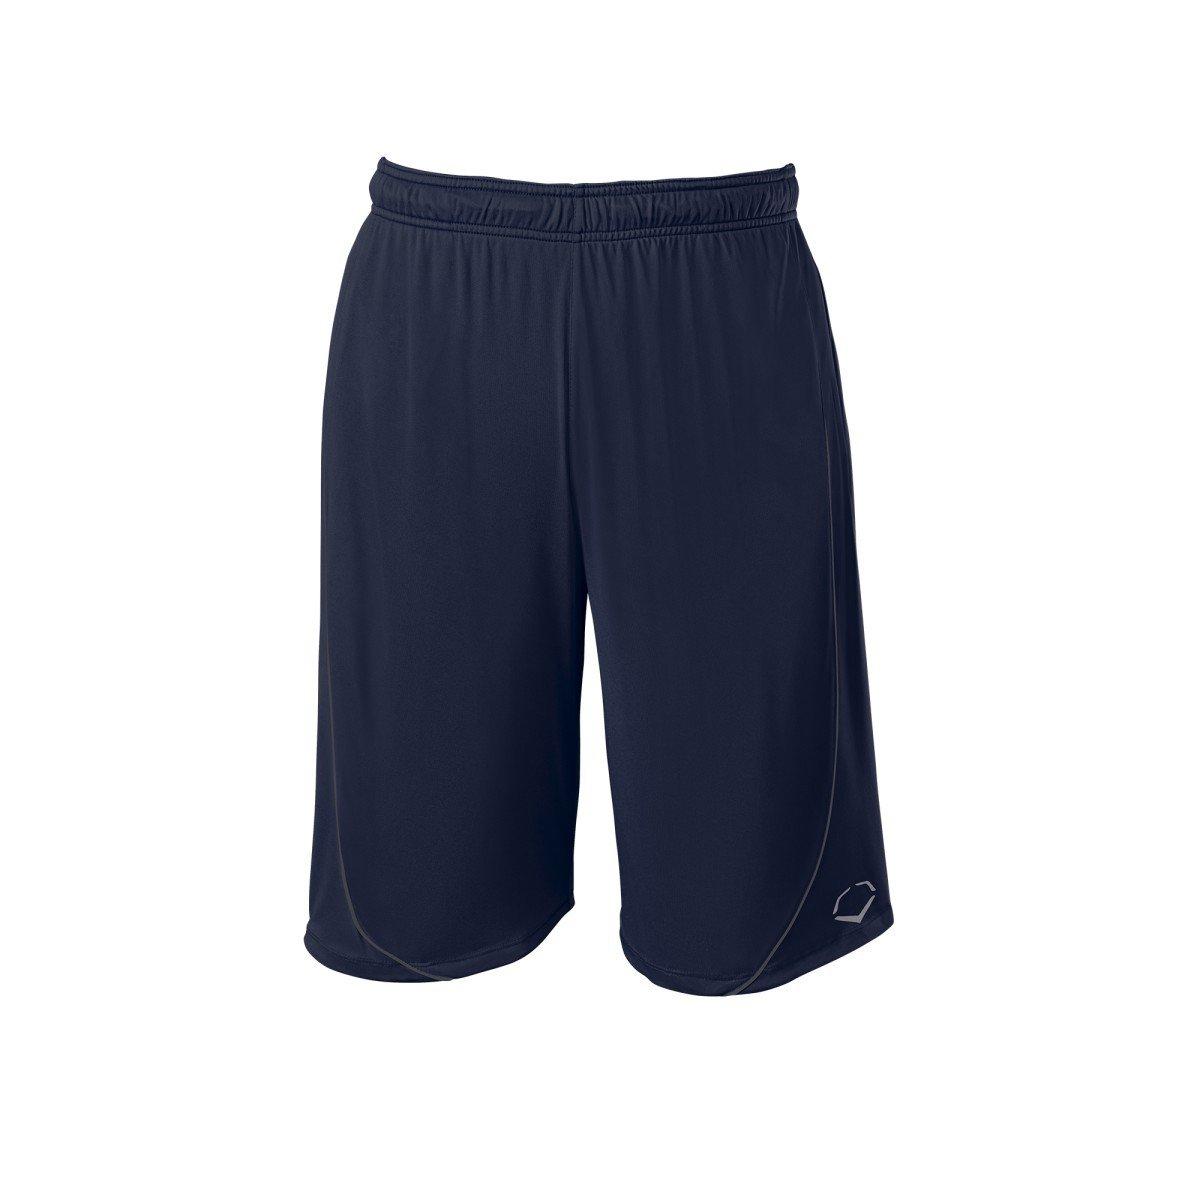 Evoshield大人用Pro Team Shorts B0742DNY4M Medium|ネイビー ネイビー Medium